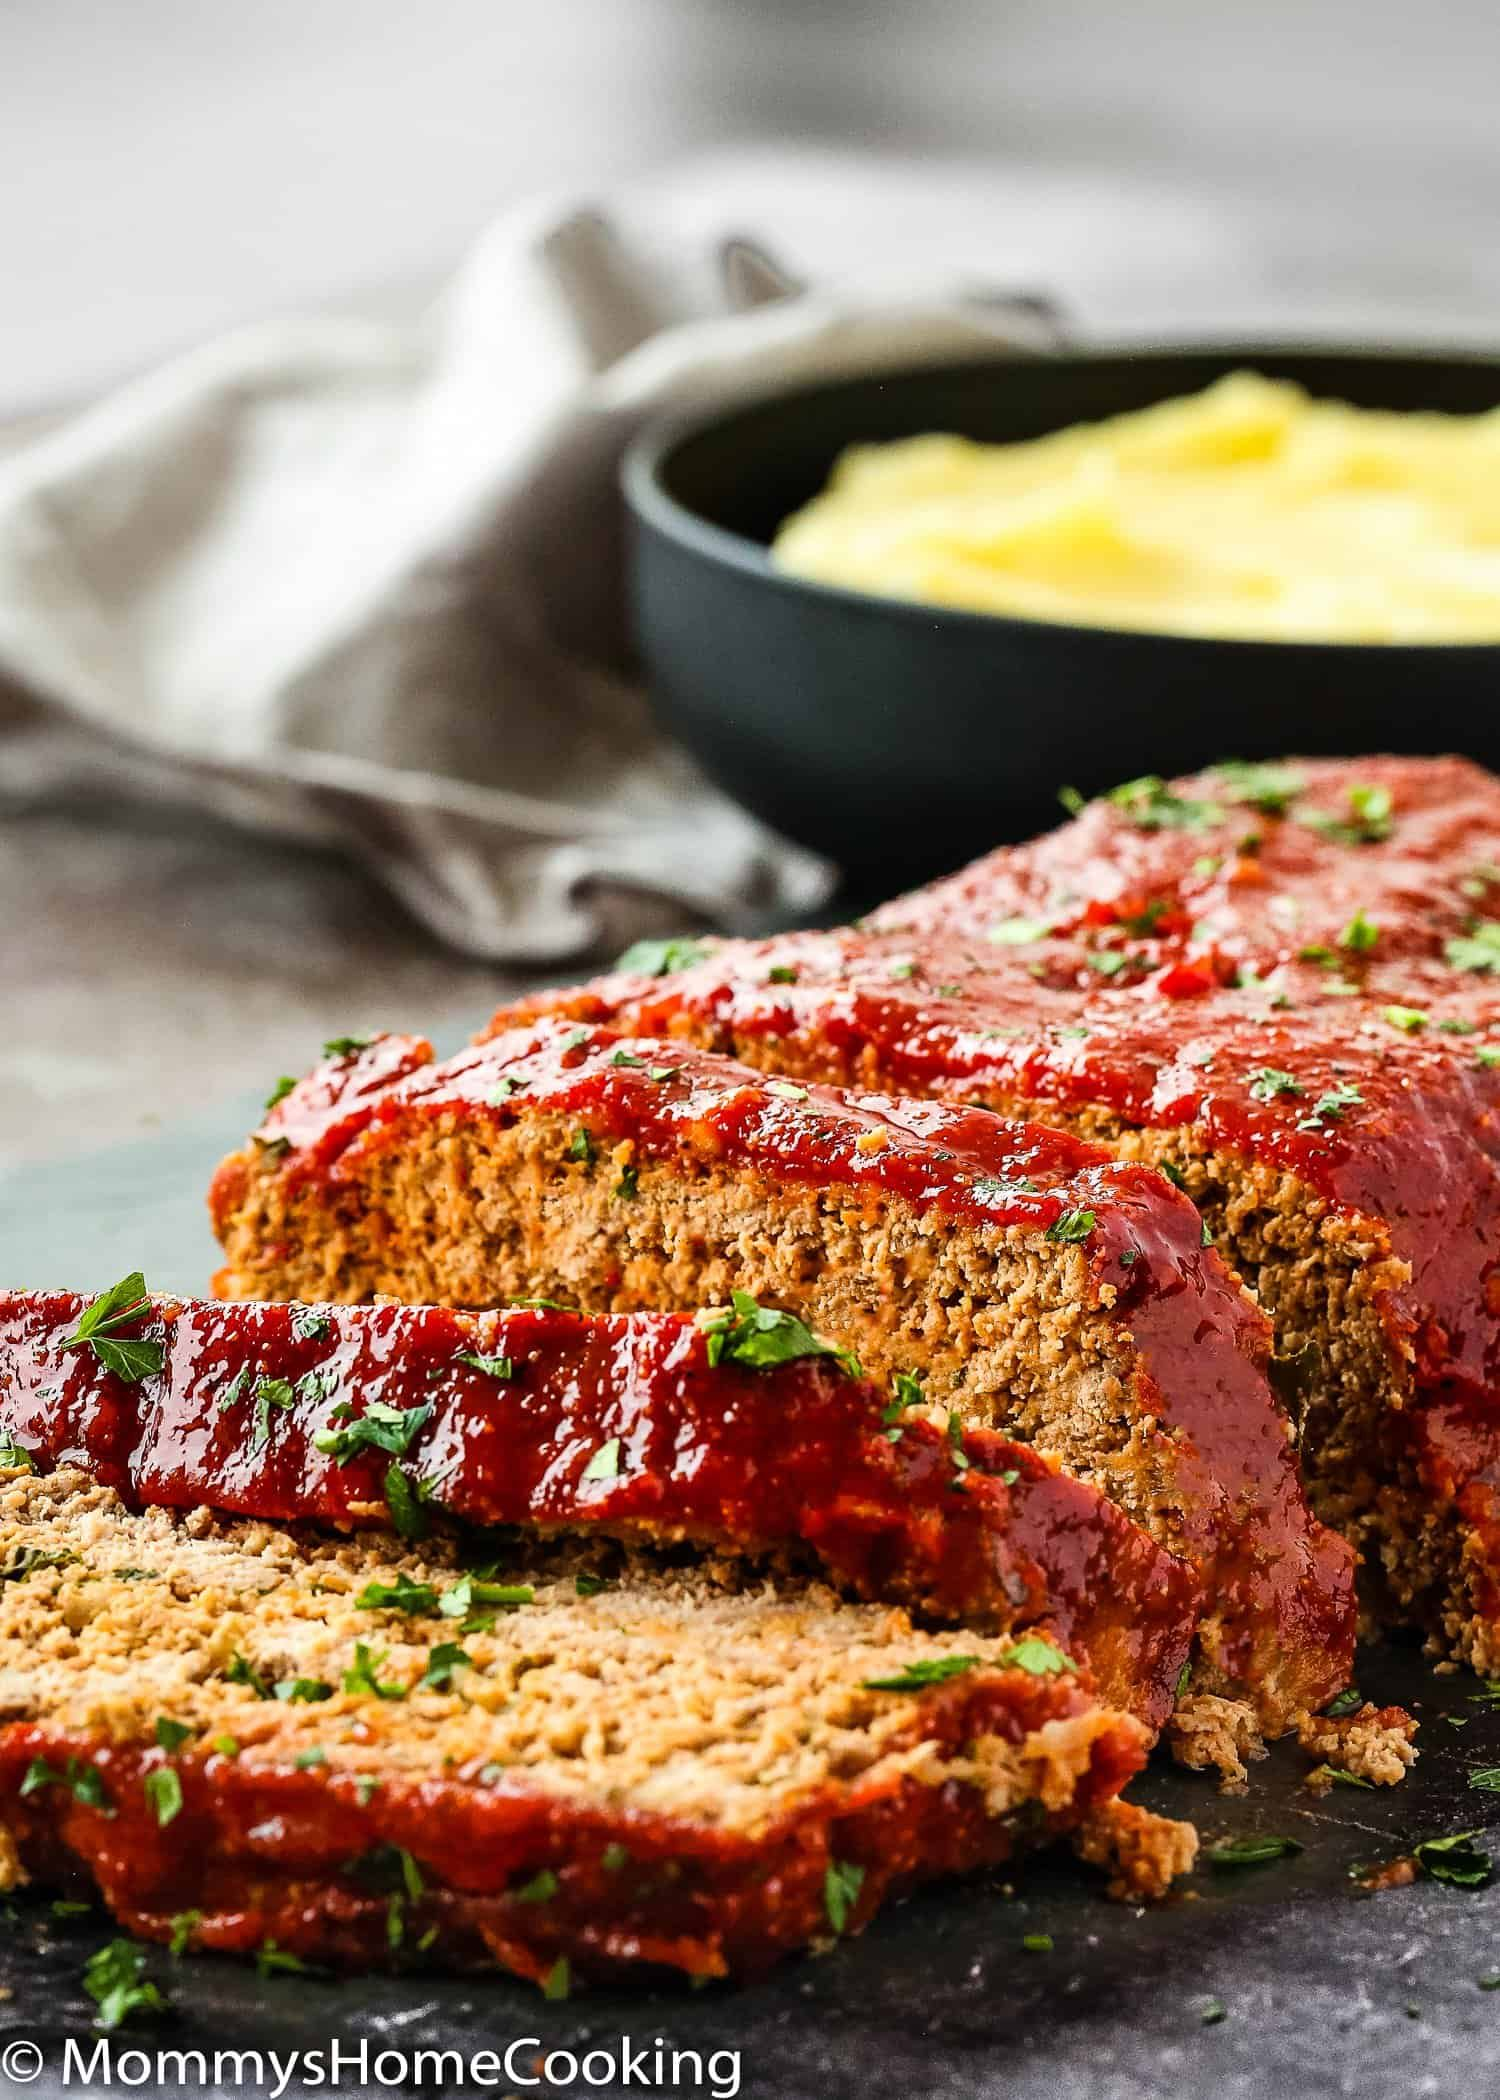 Easy Eggless Meatloaf Recipe Eggless Meatloaf Meatloaf Eggless Recipes